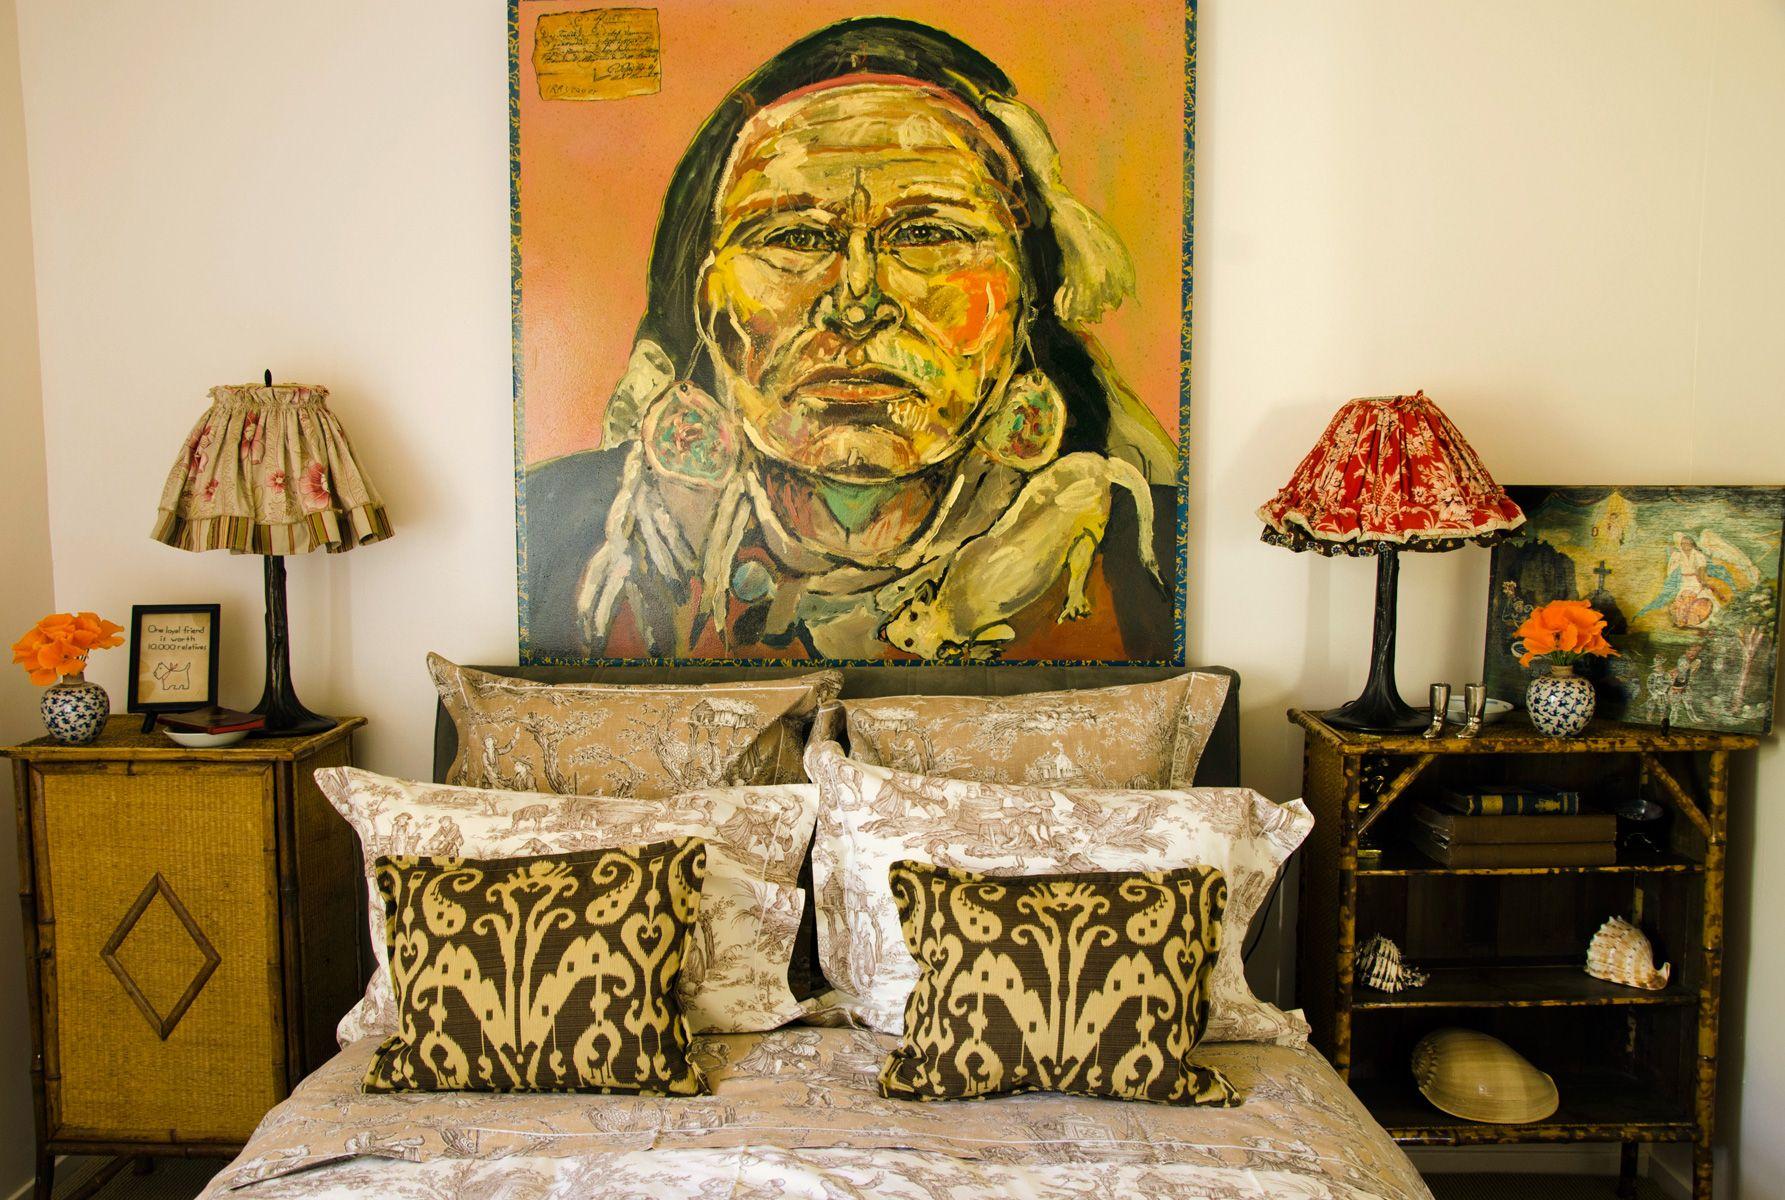 wall decor photos & paintings | HOME Wall decor photos & paintings ...